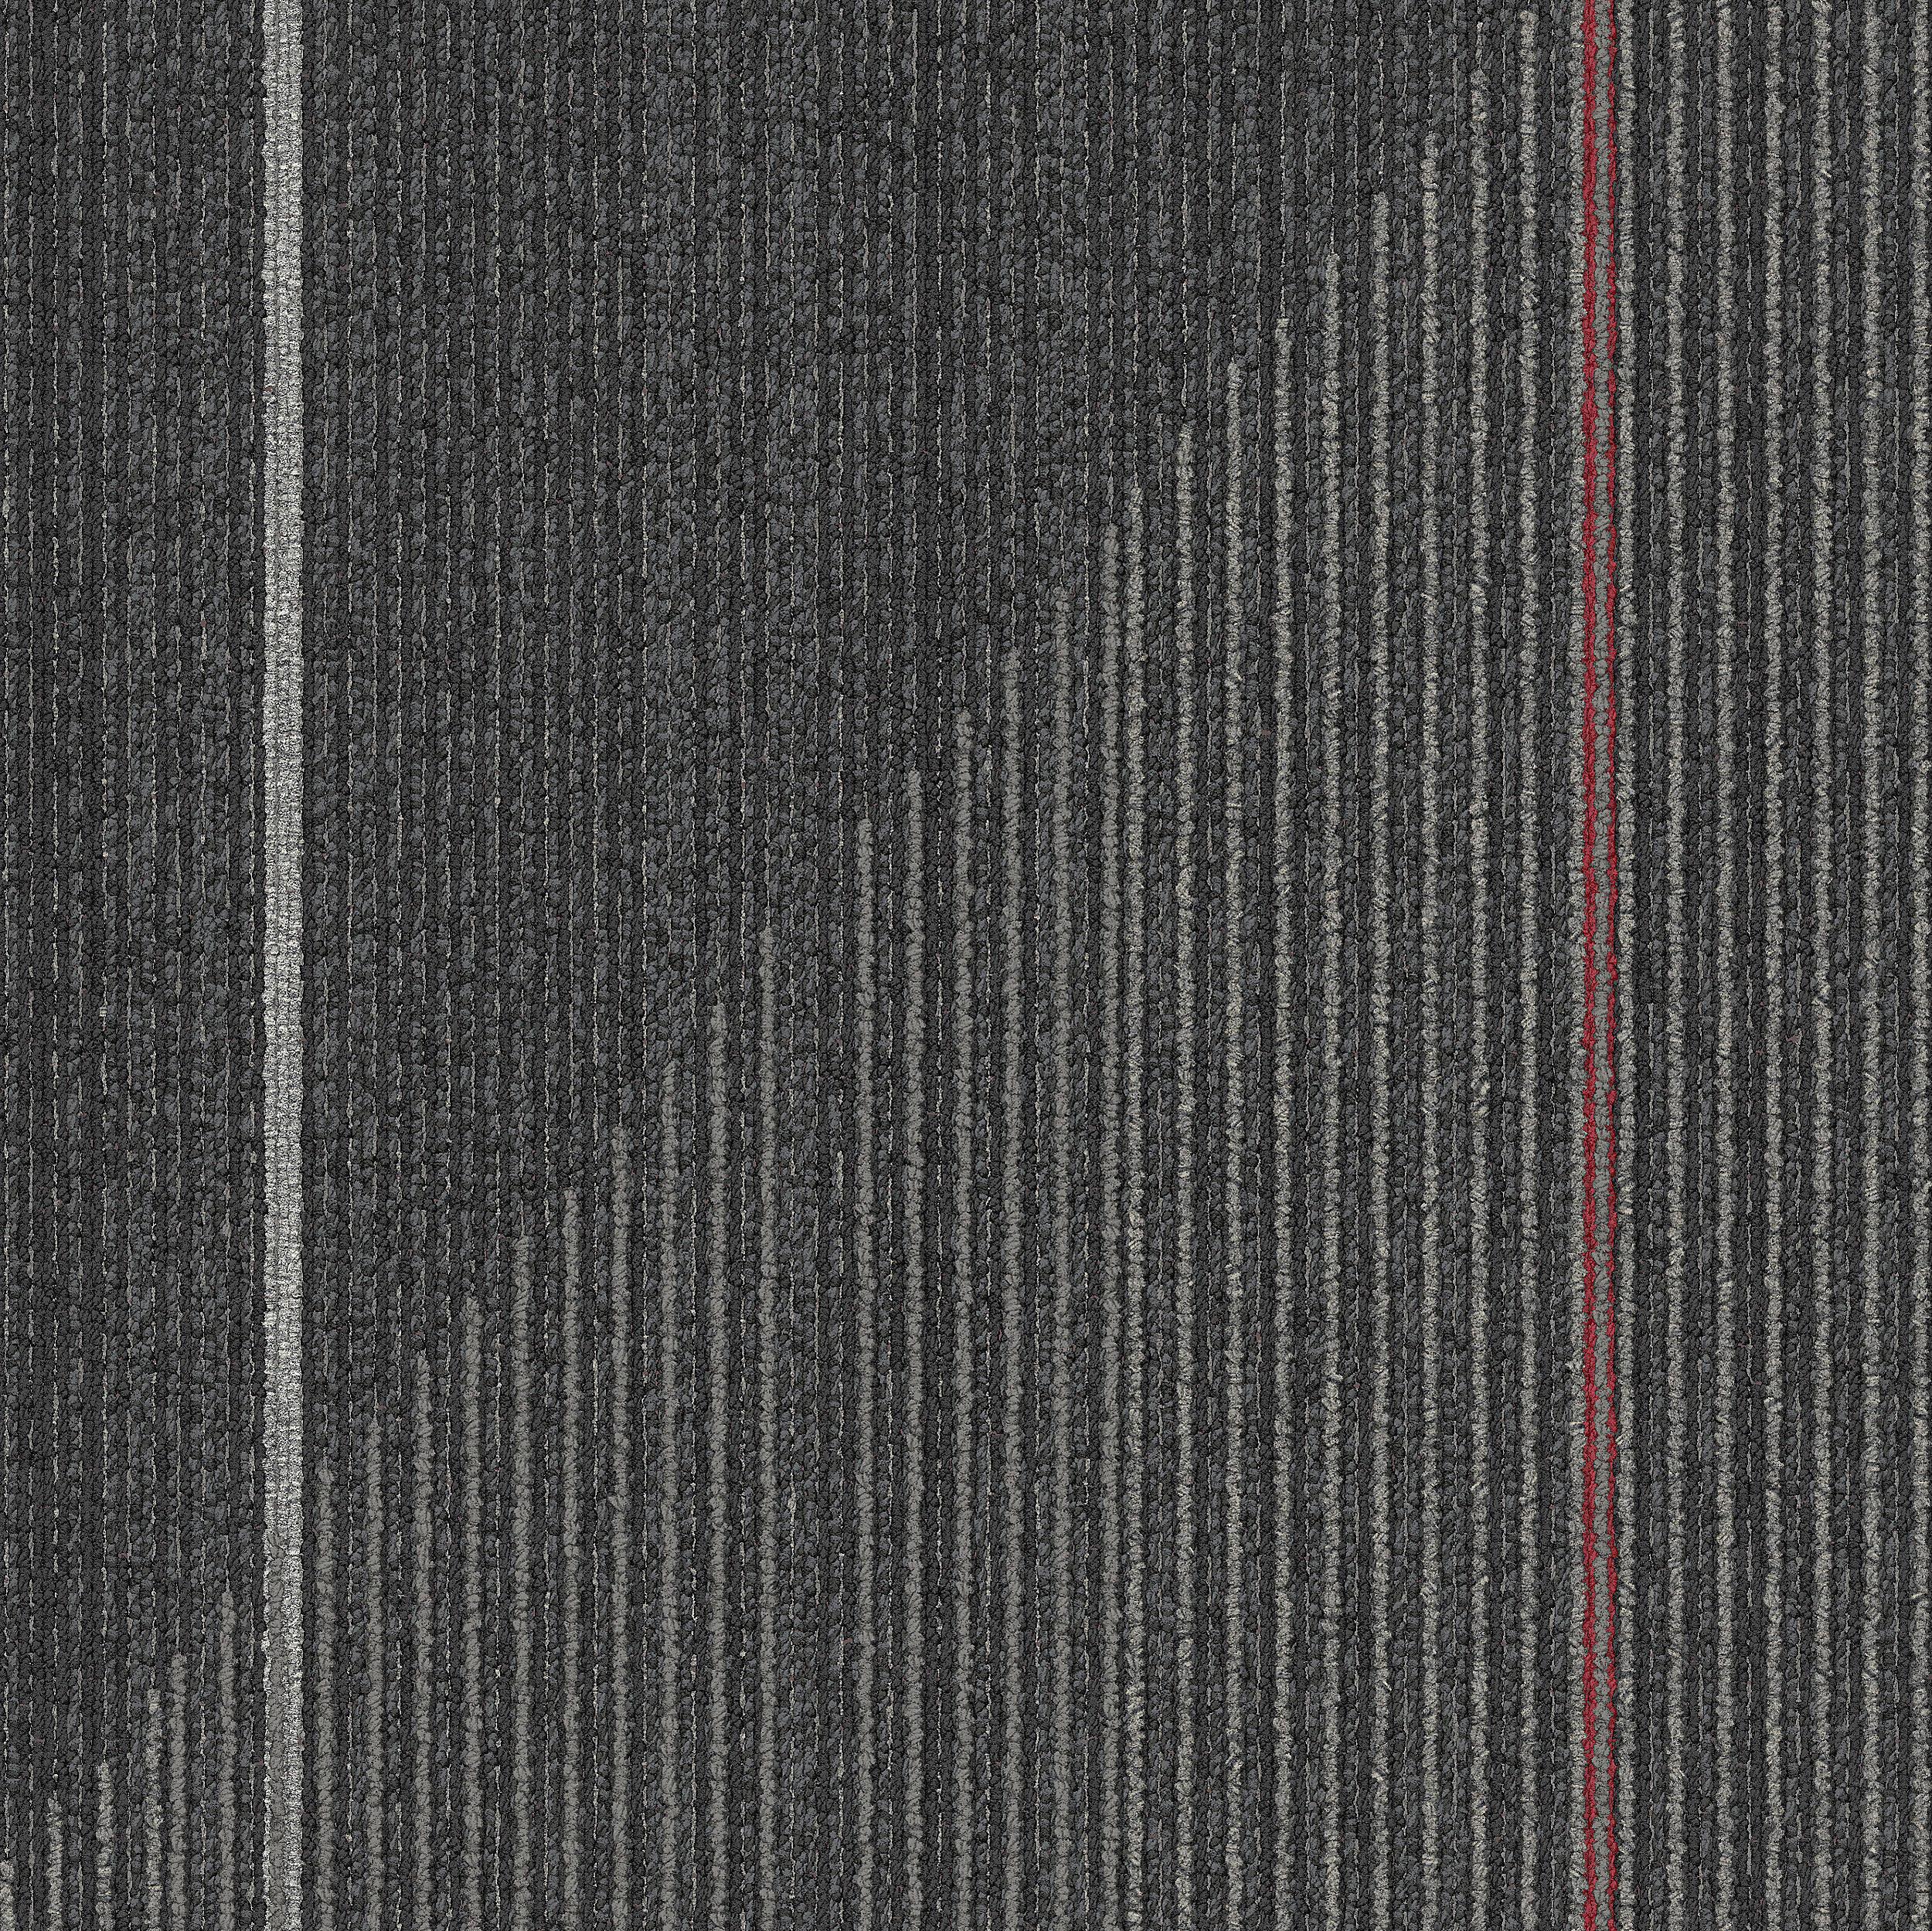 Detours Onyx Carpet Tiles From Interface Usa Architonic